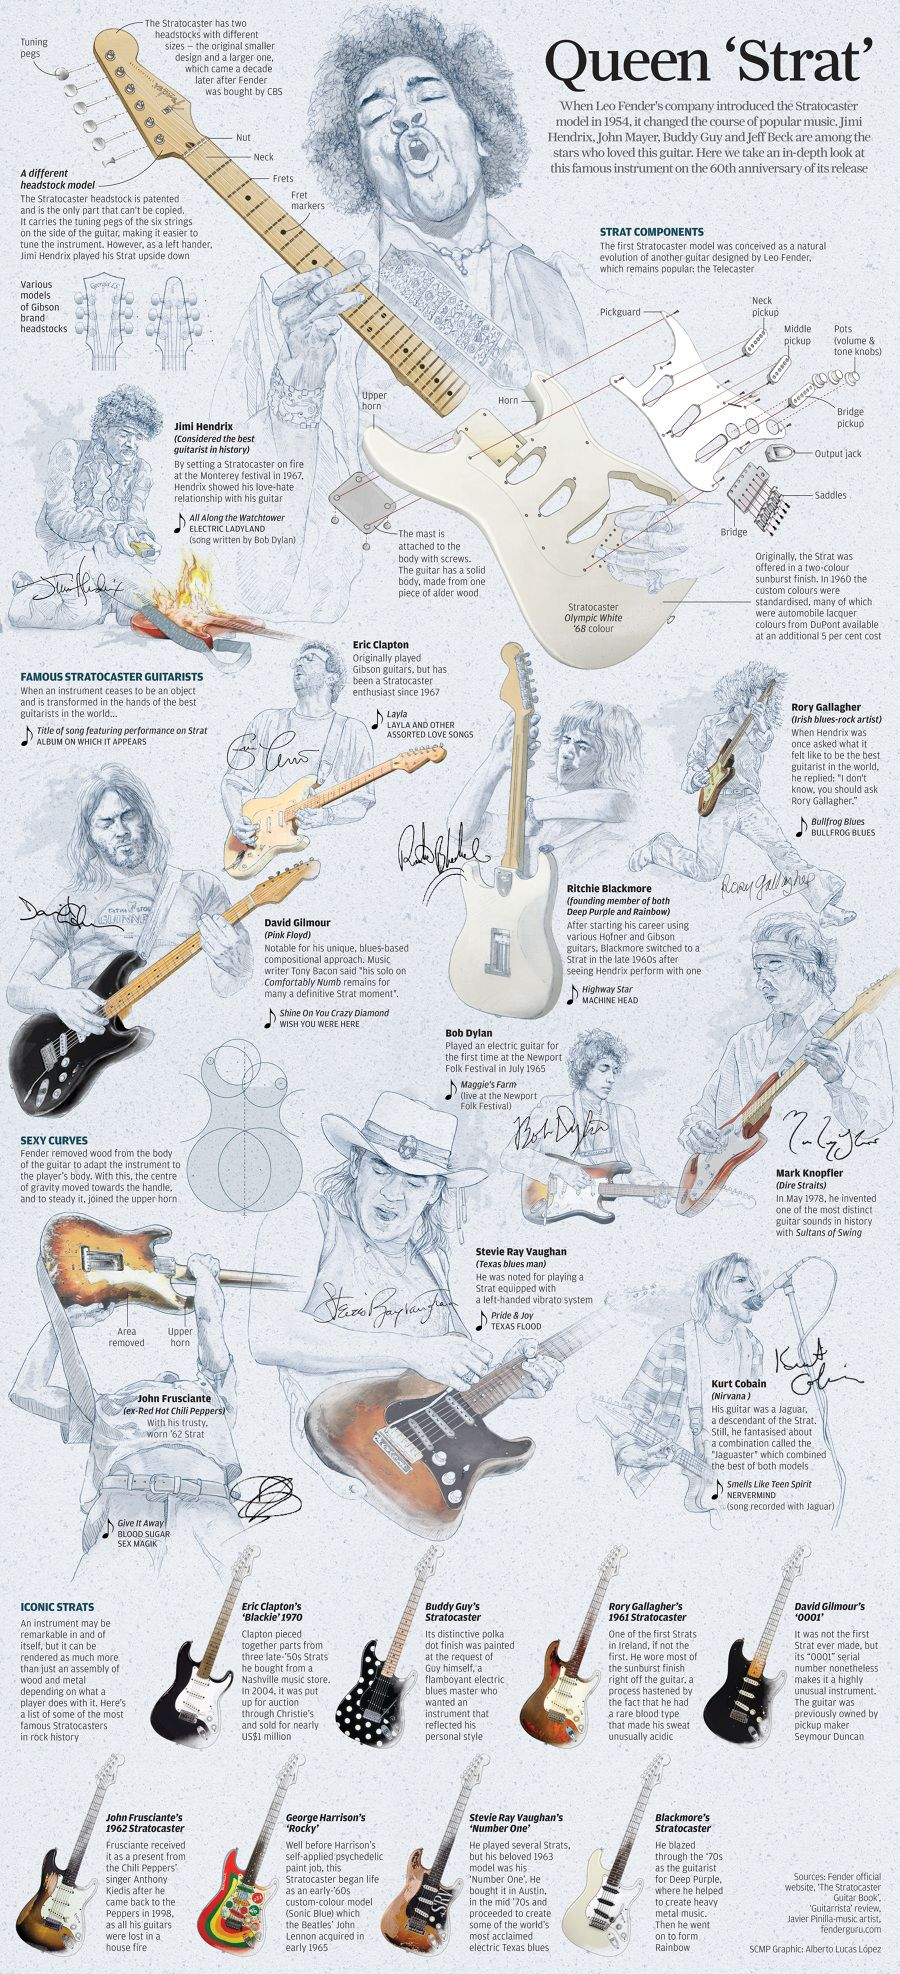 bullfrog blues strat guitar wiring diagram 6 14 stefvandenheuvel nl \u2022khristian leiva khristian mxc on pinterest rh pinterest com